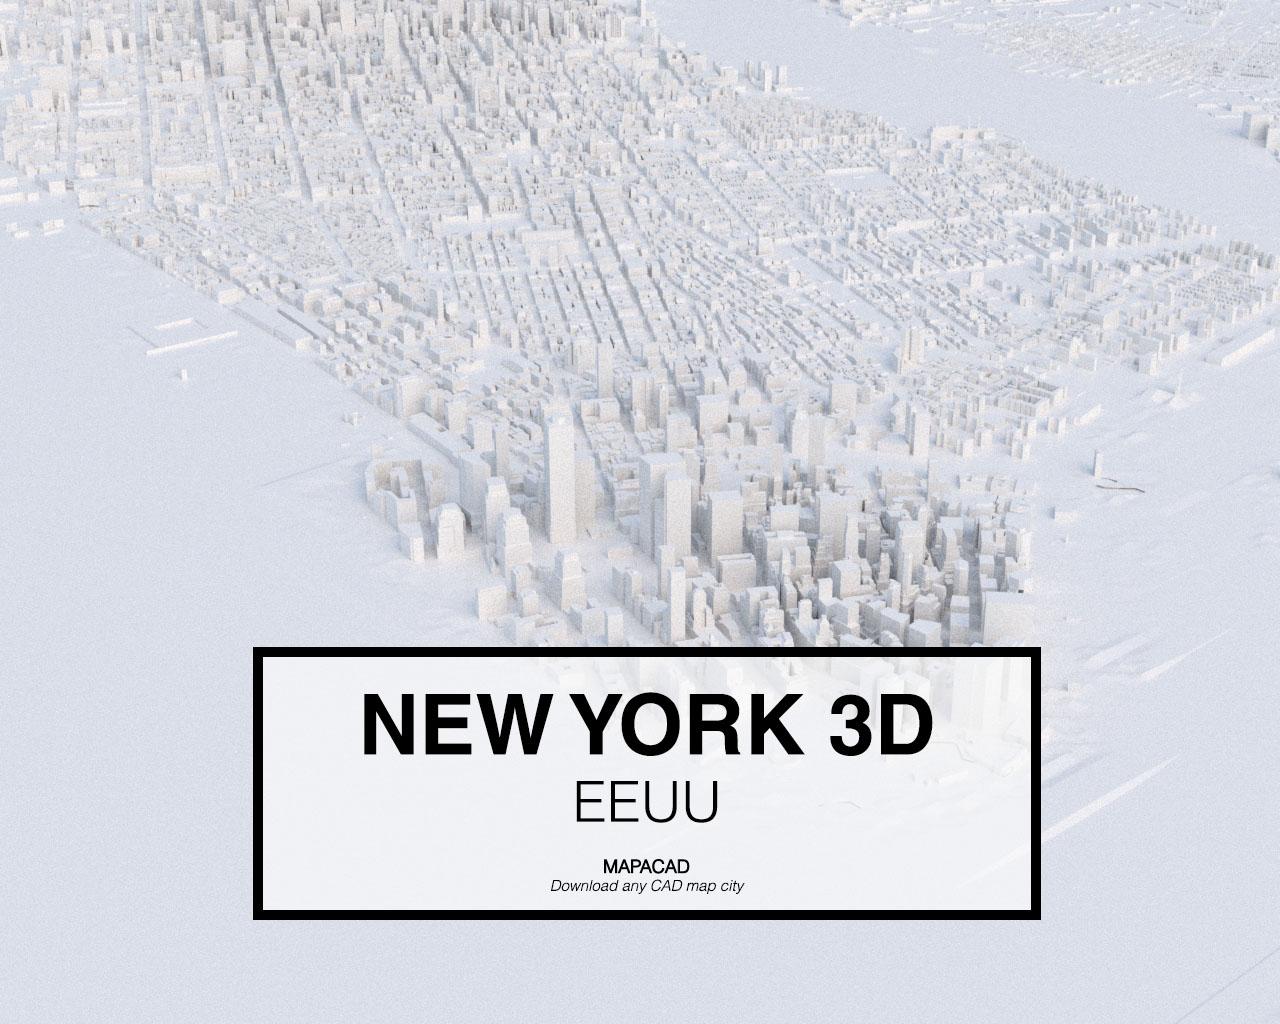 Map Of New York 3d.En New York 3d Es Nueva York 3d